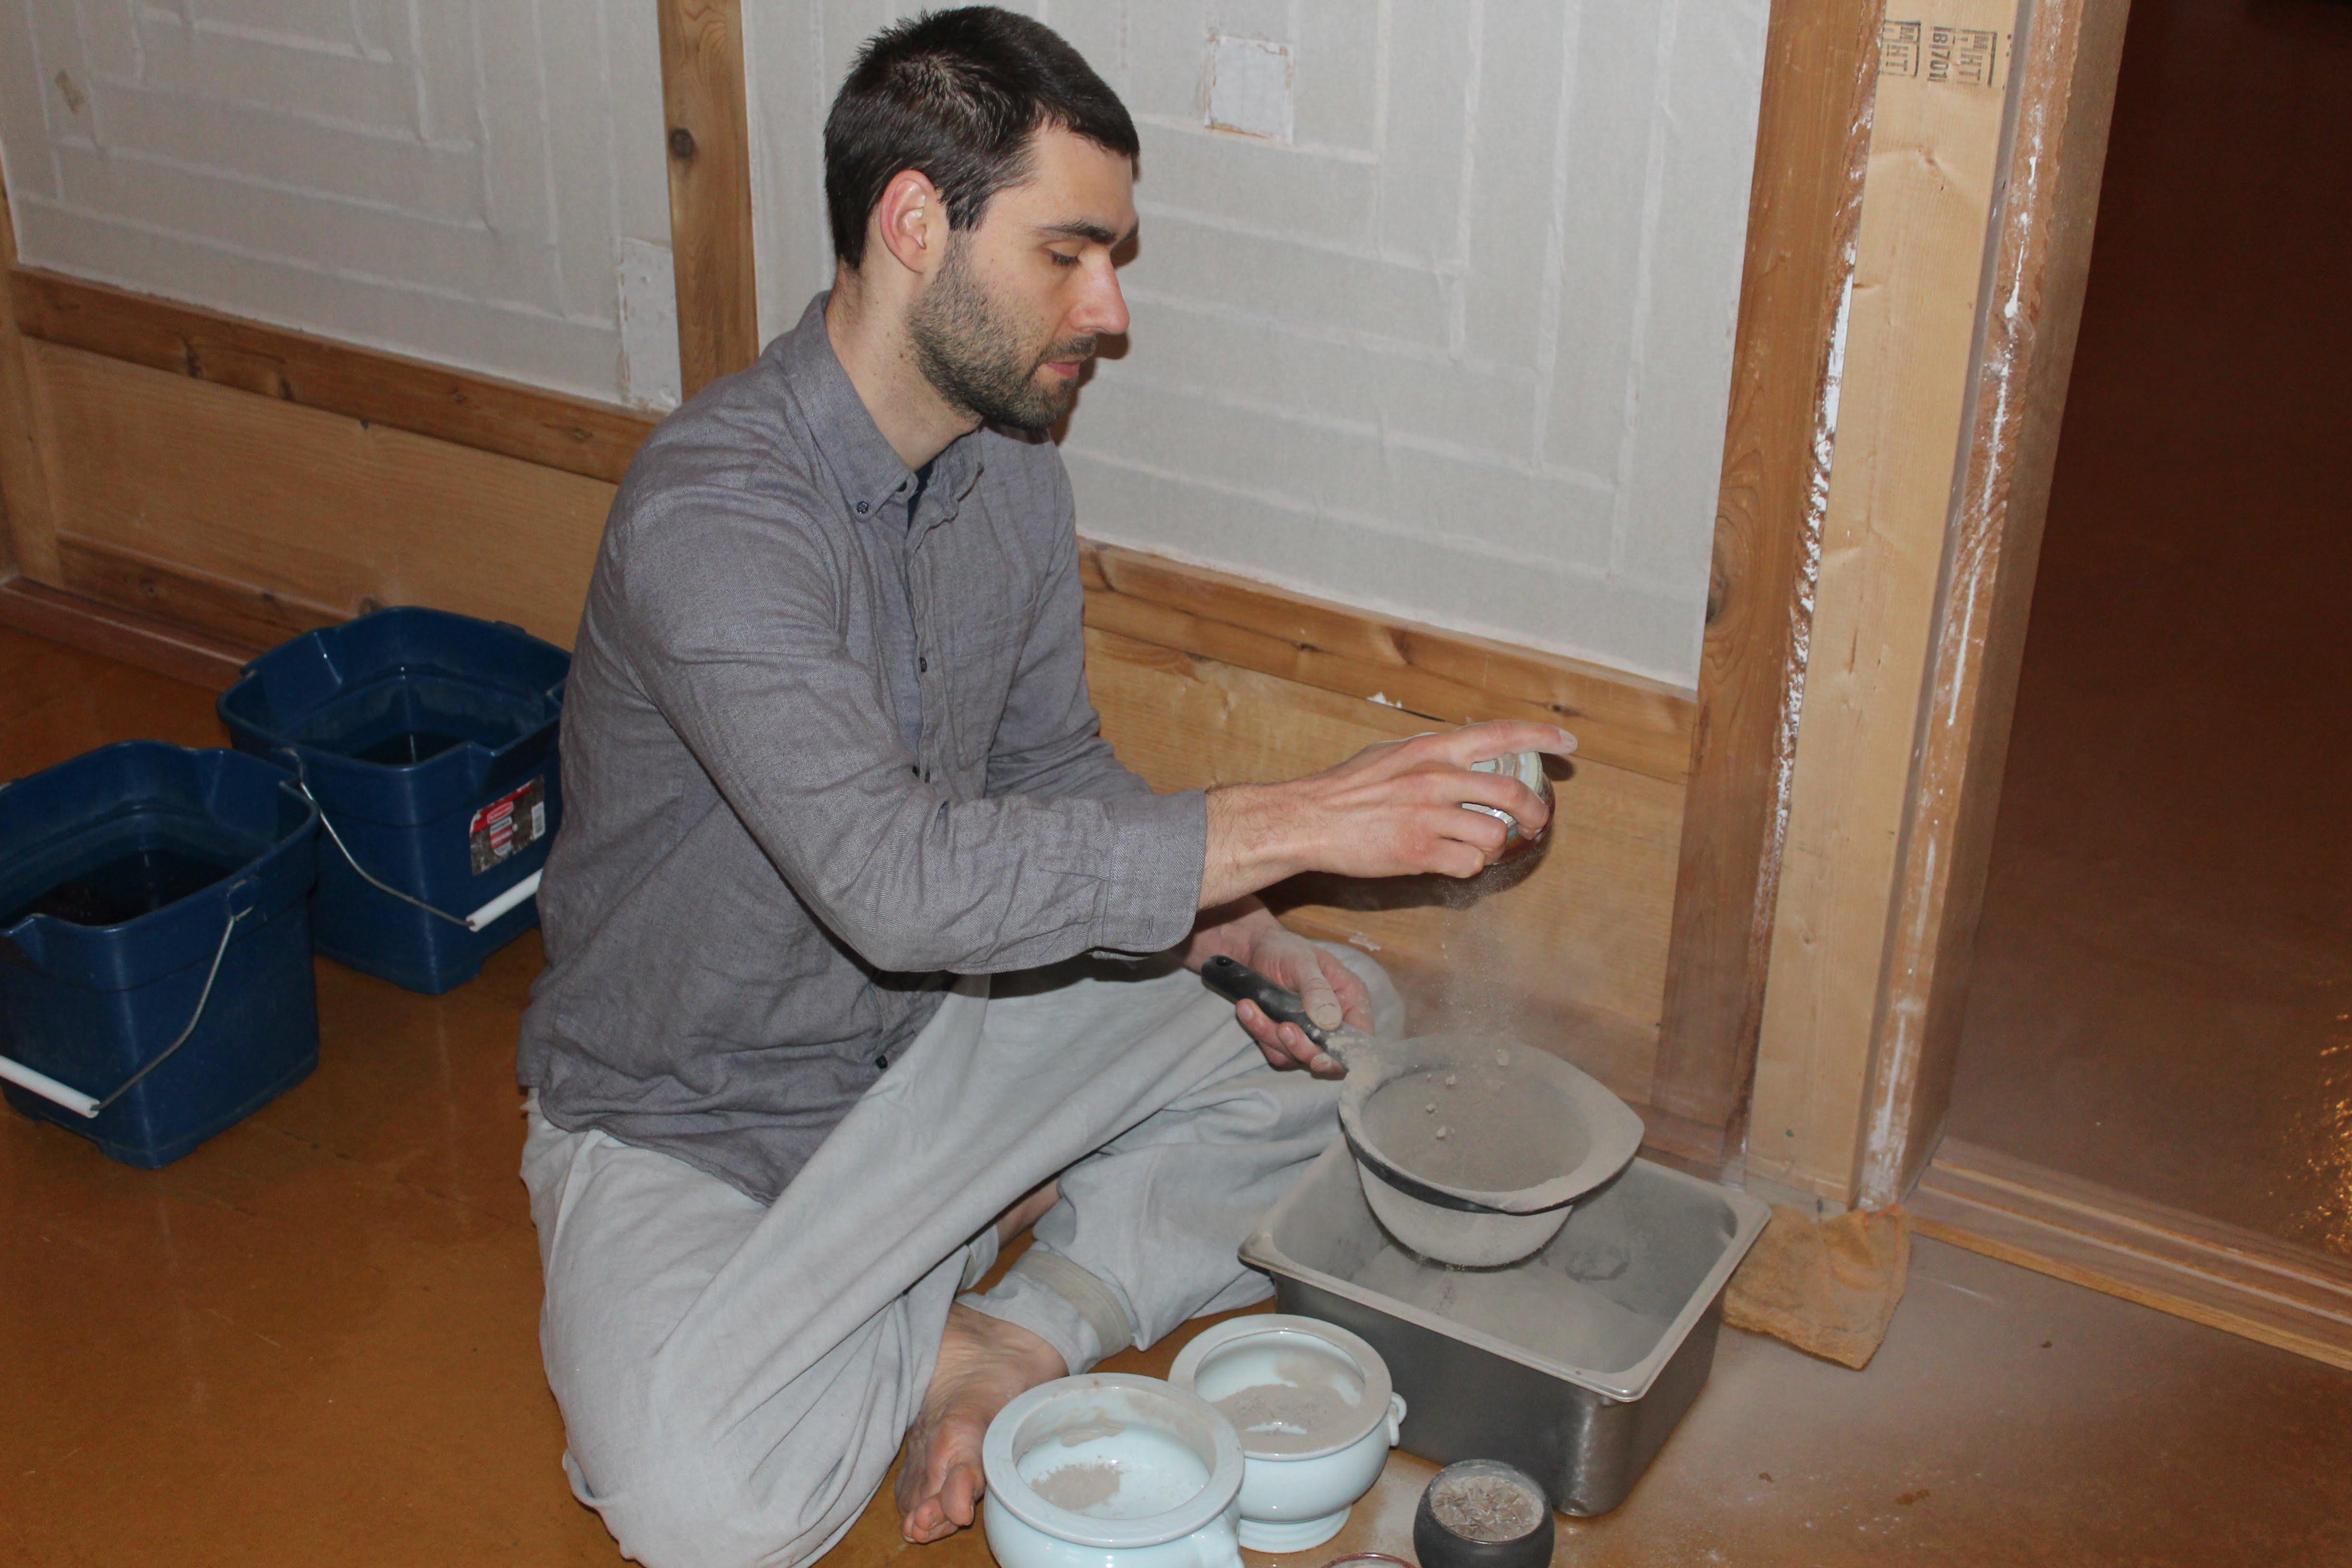 Majin Luke Niewiadowski refilling incense bowls.